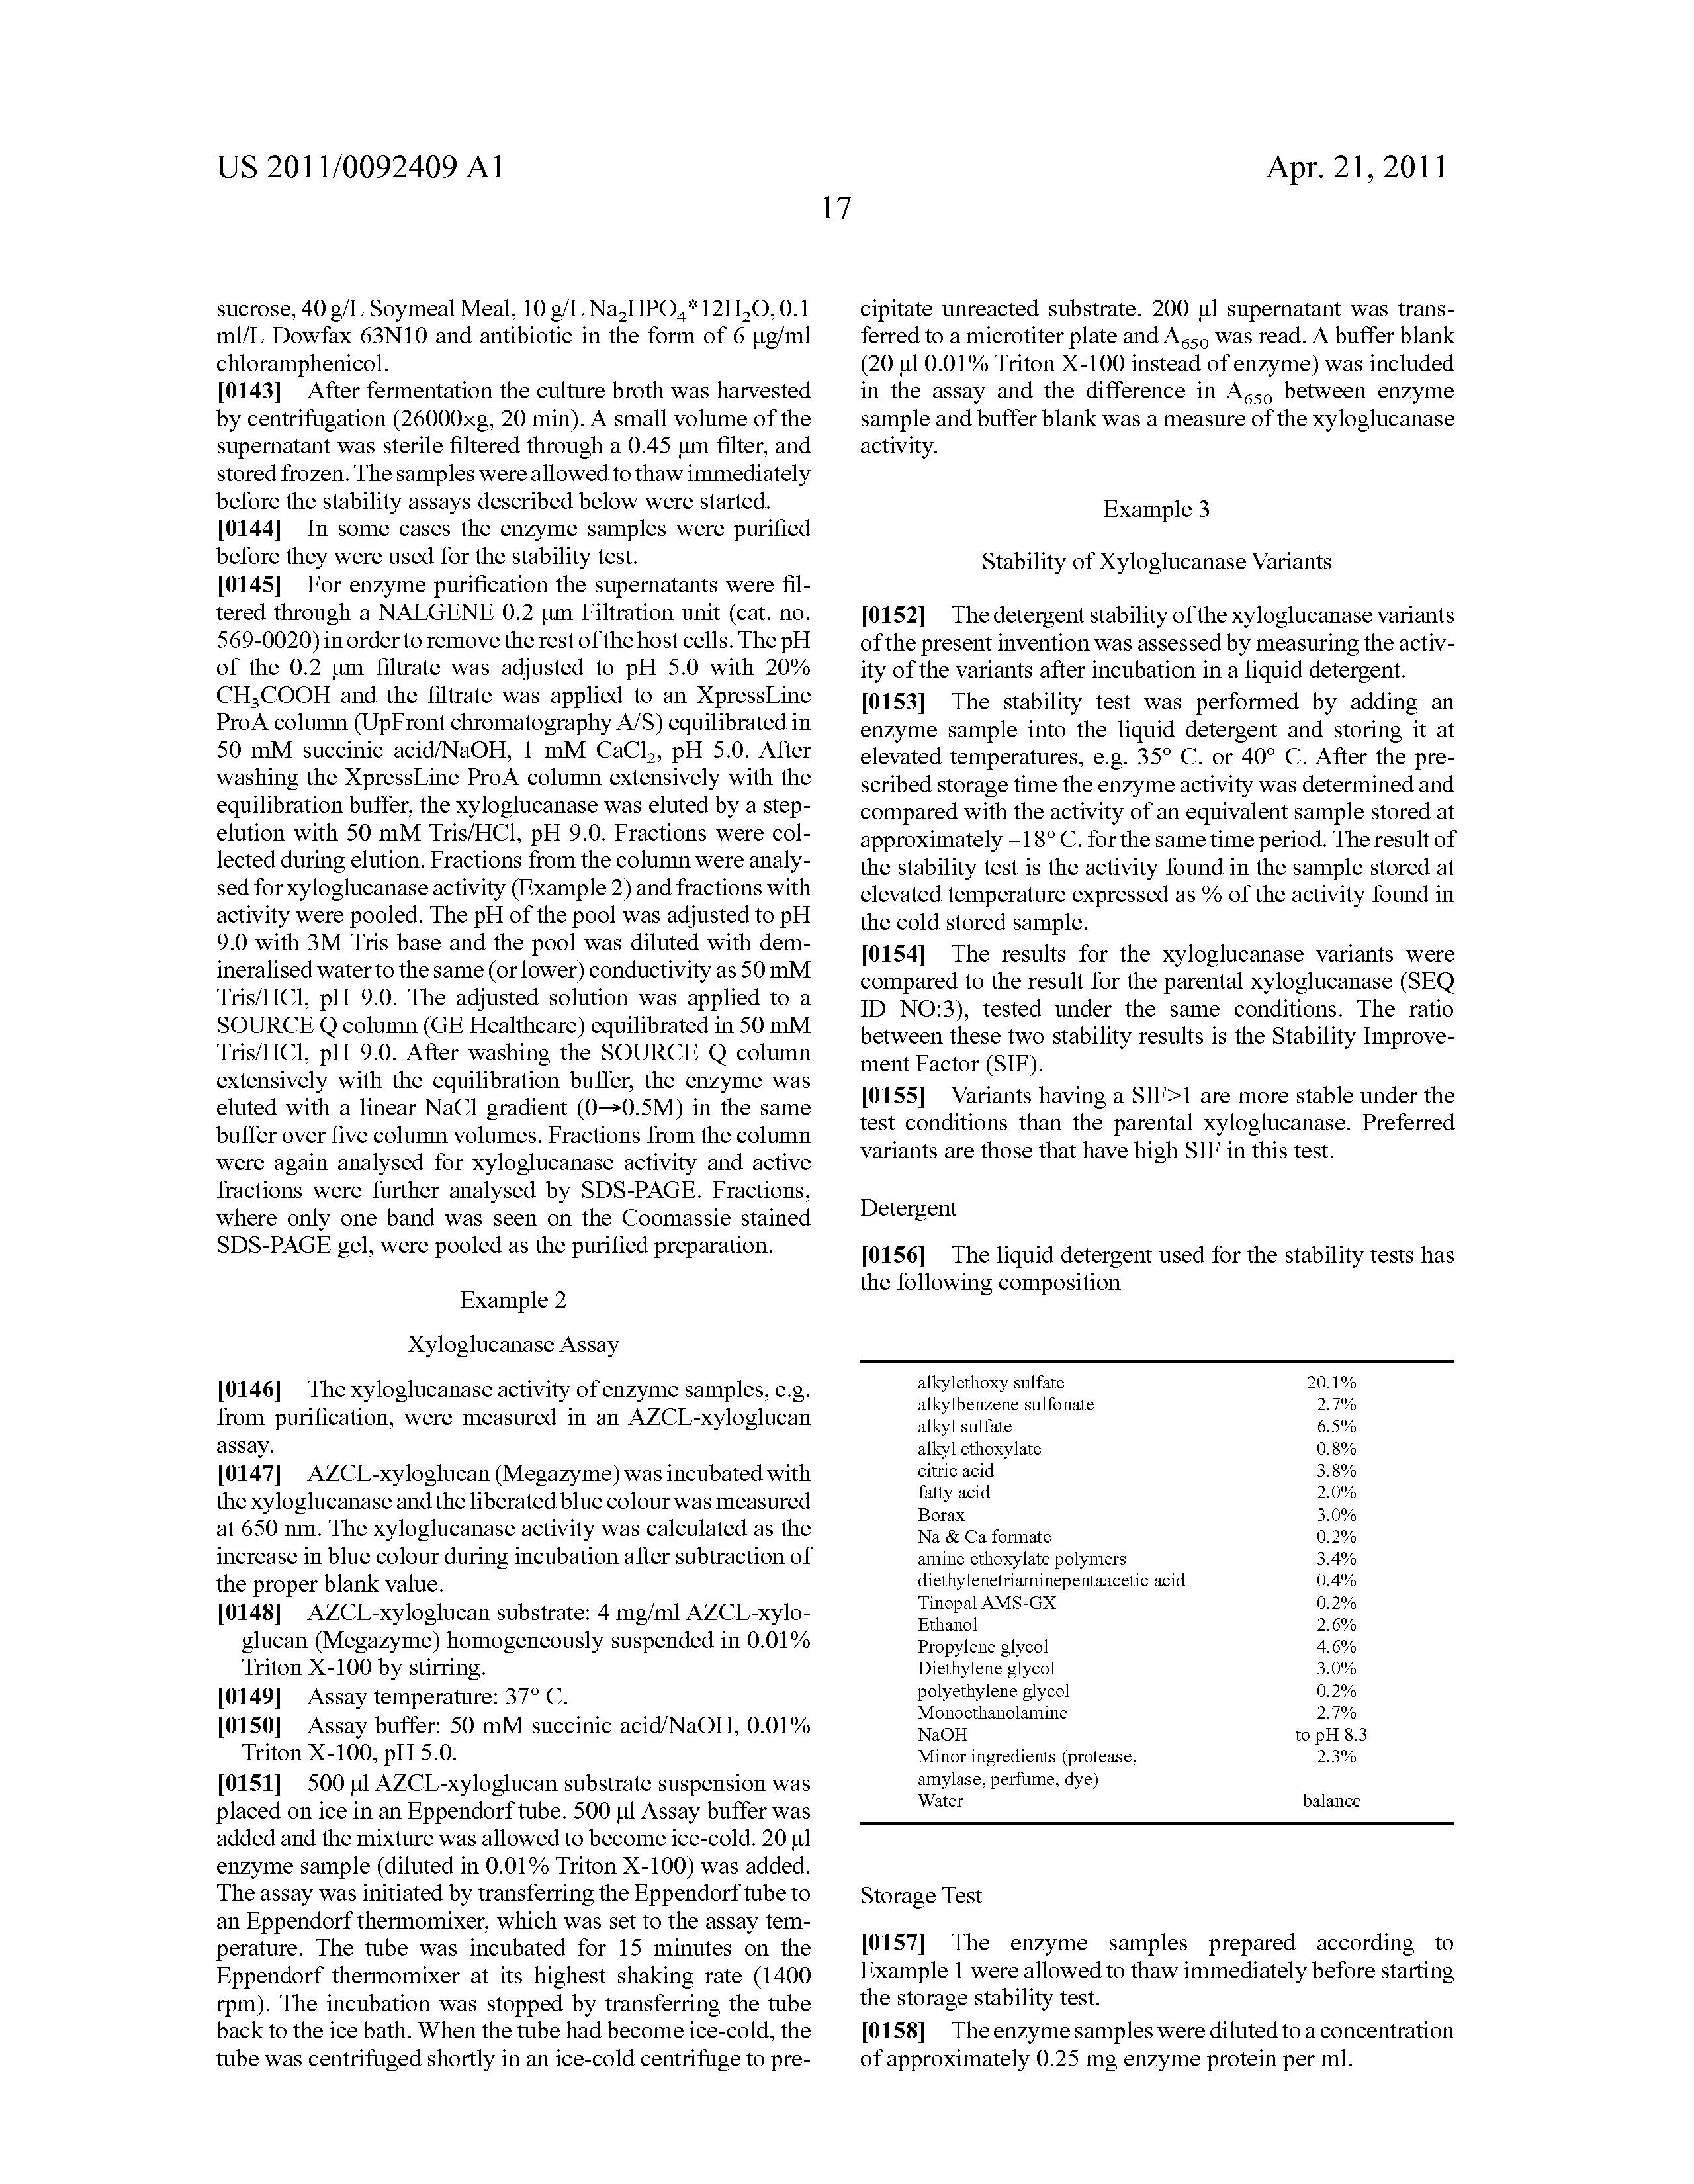 US 2011/0092409 A1 - Variants Of A Family 44 Xyloglucanase